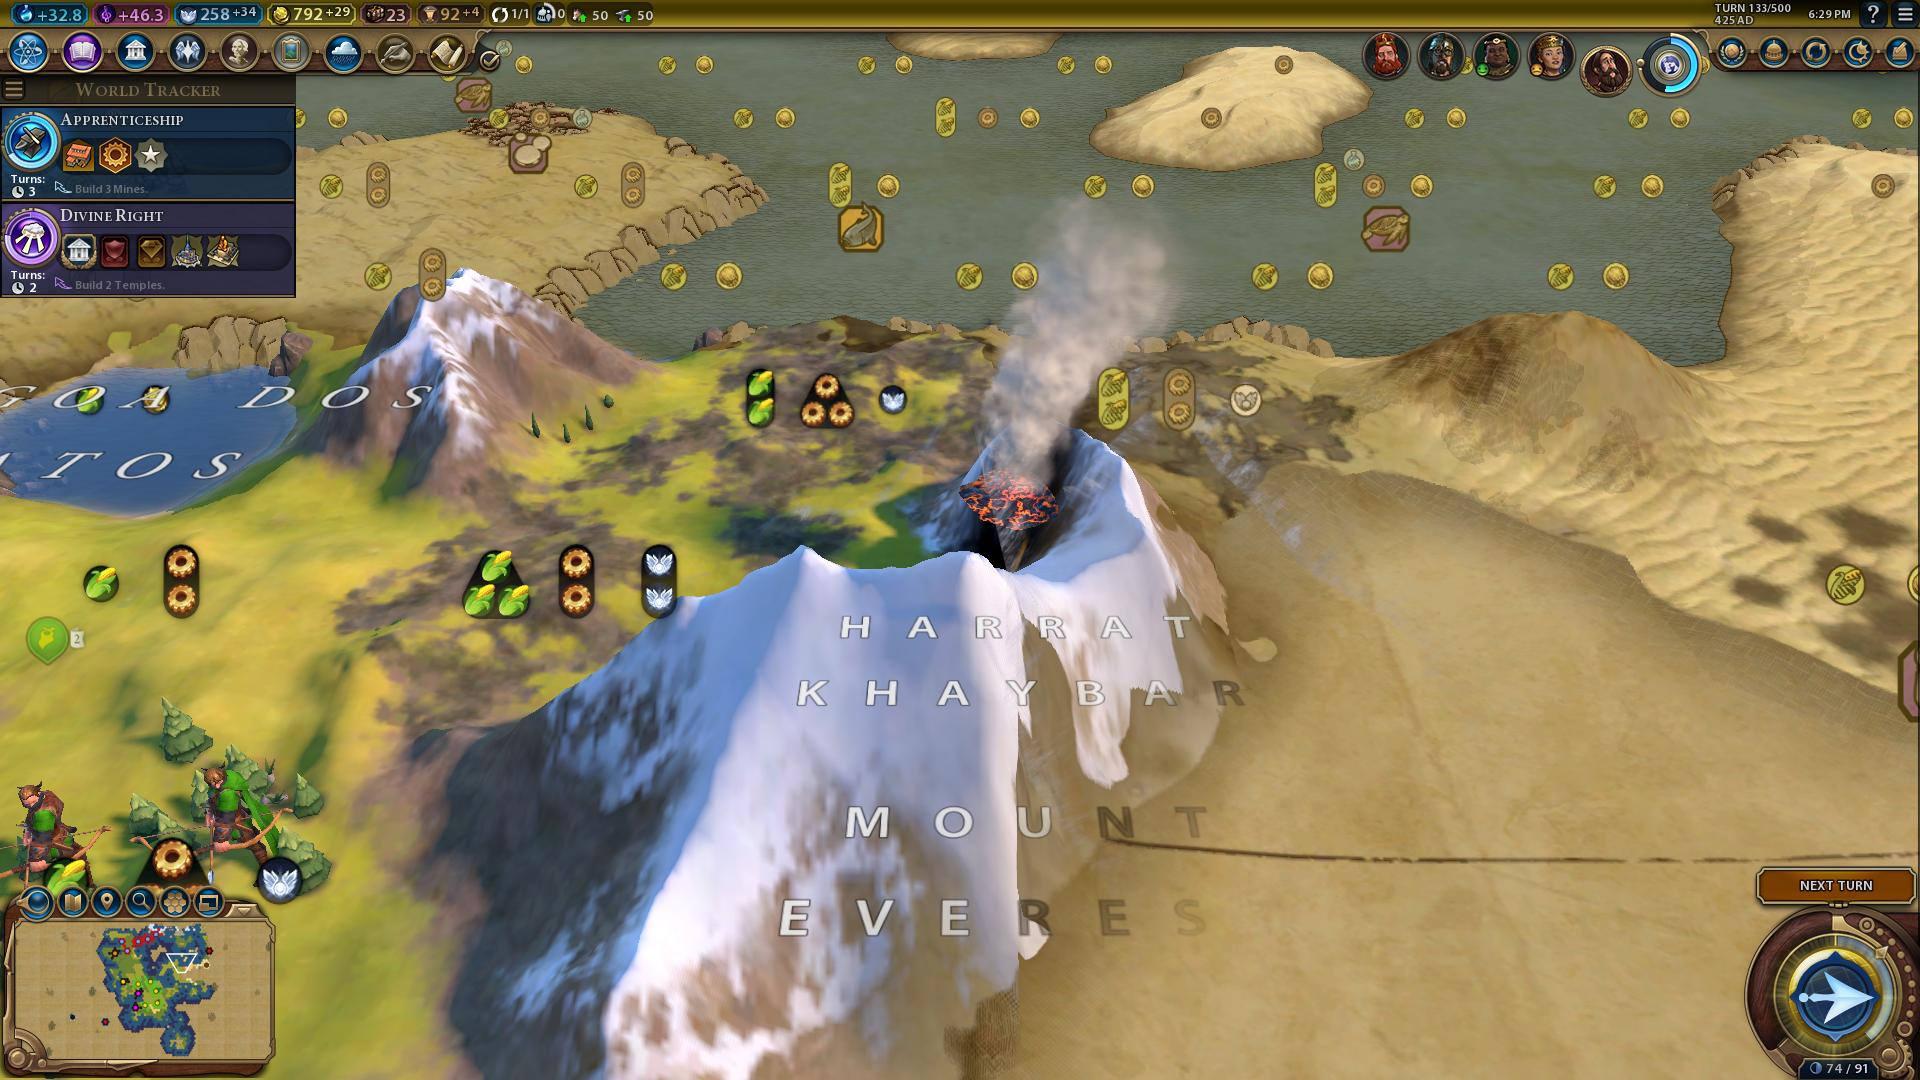 Mount Everest Volcano glitch.png